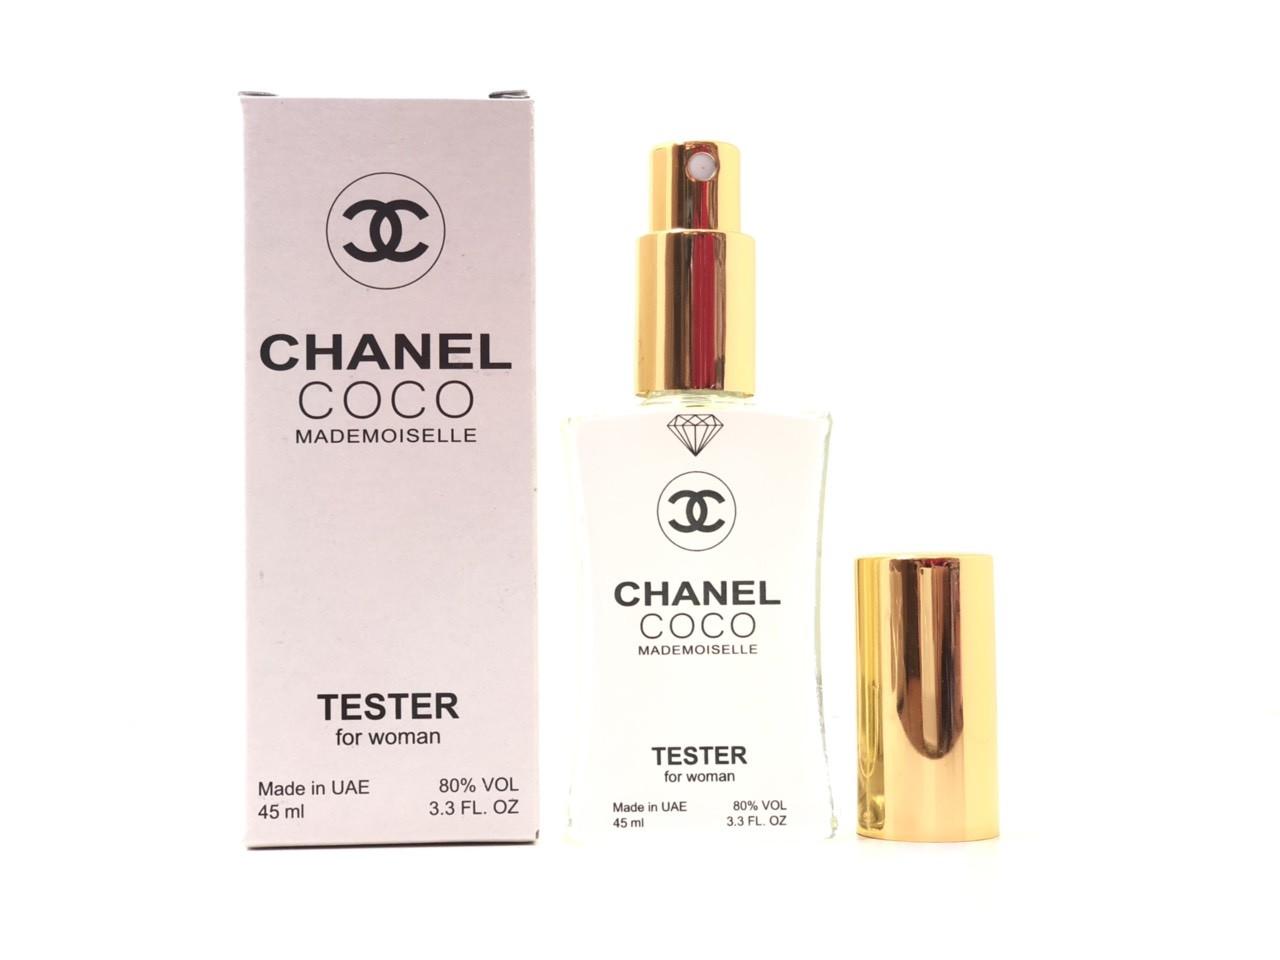 Женский парфюм Coco Chanel Mademoiselle (Шанель Коко Мадмуазель) 45 мл Diamond - реплика